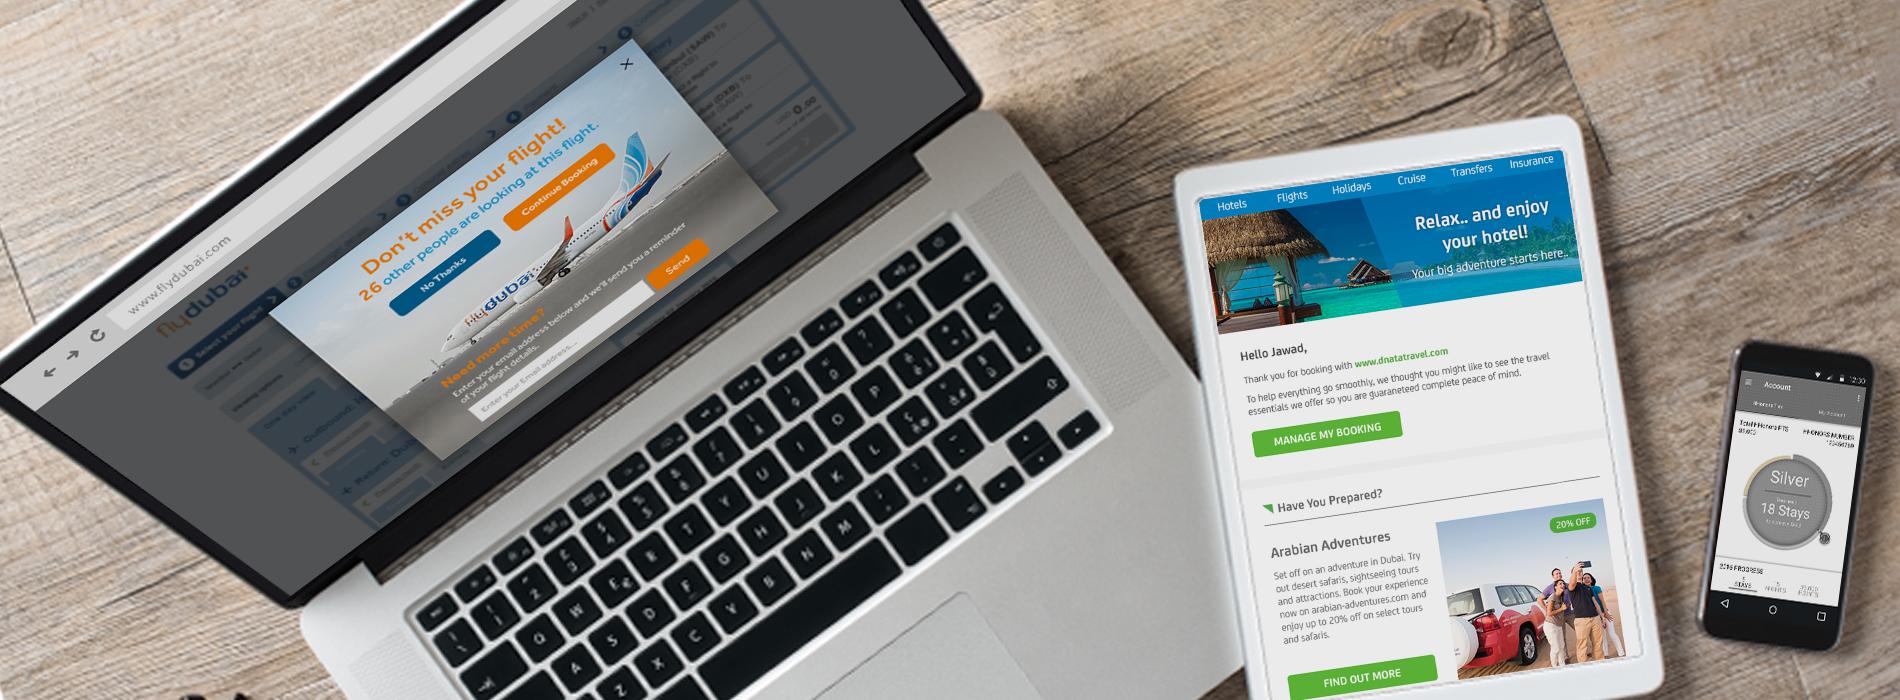 [Webinar] How Do The World's Biggest Travel Brands Convert Online?